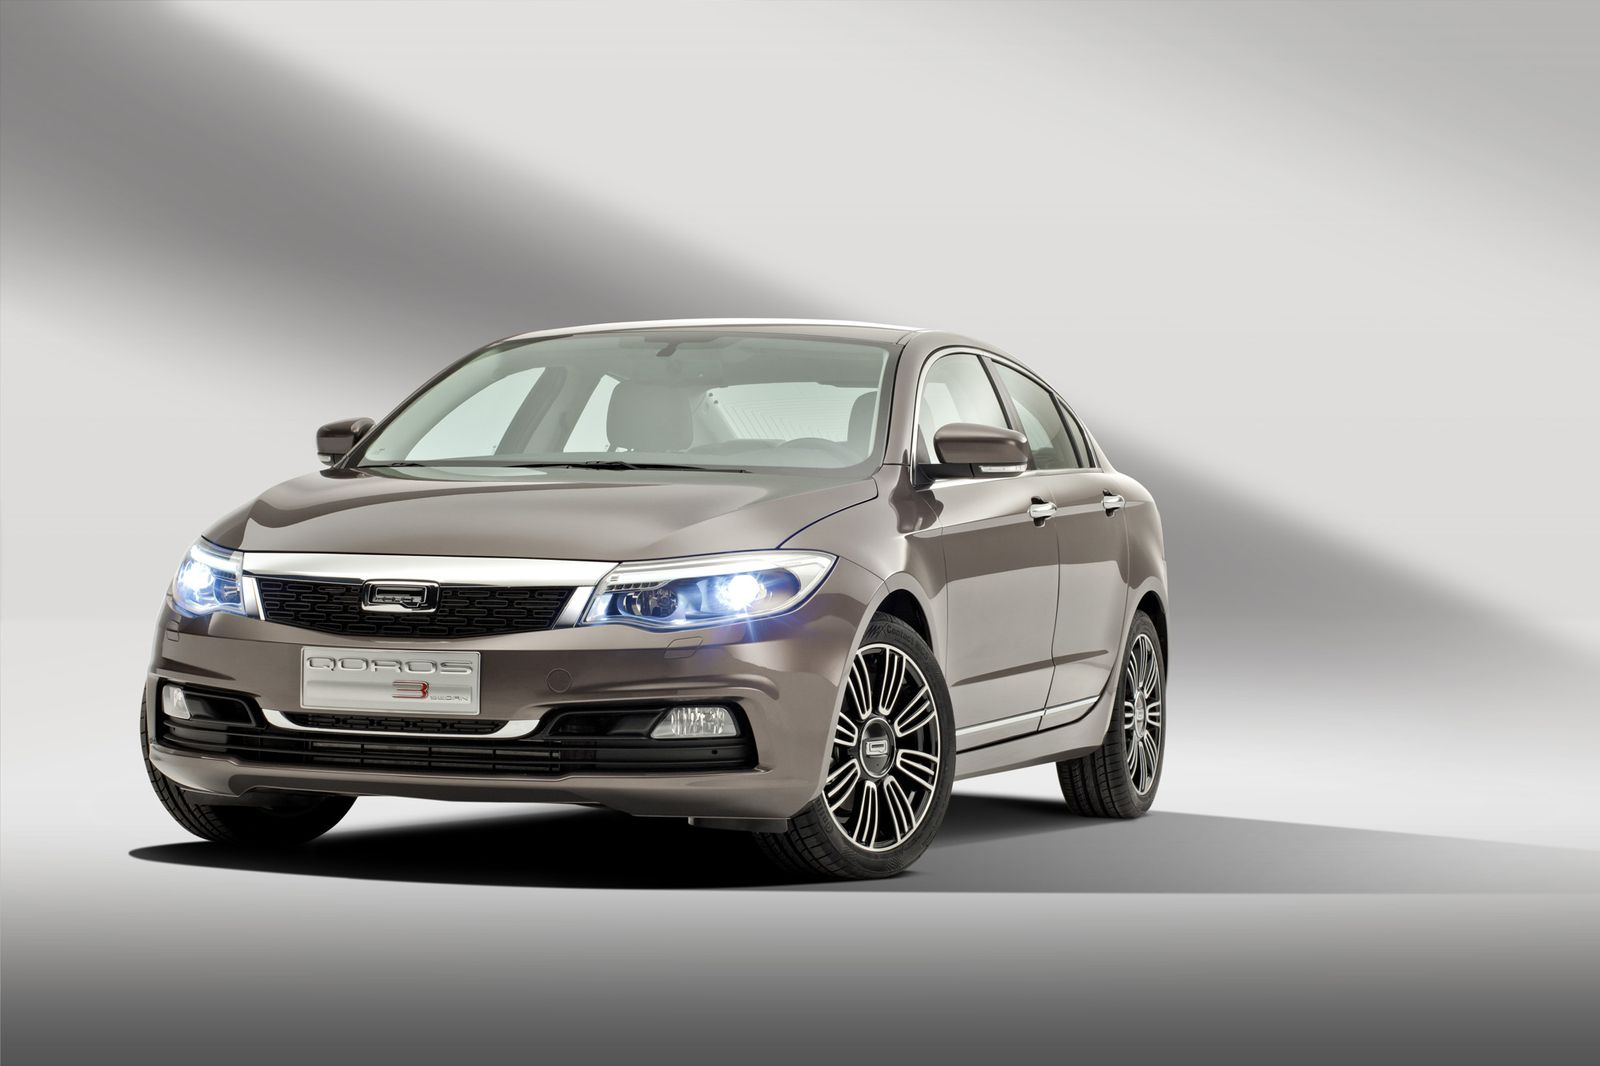 Genf / 2013 / Qorso 3 Sedan